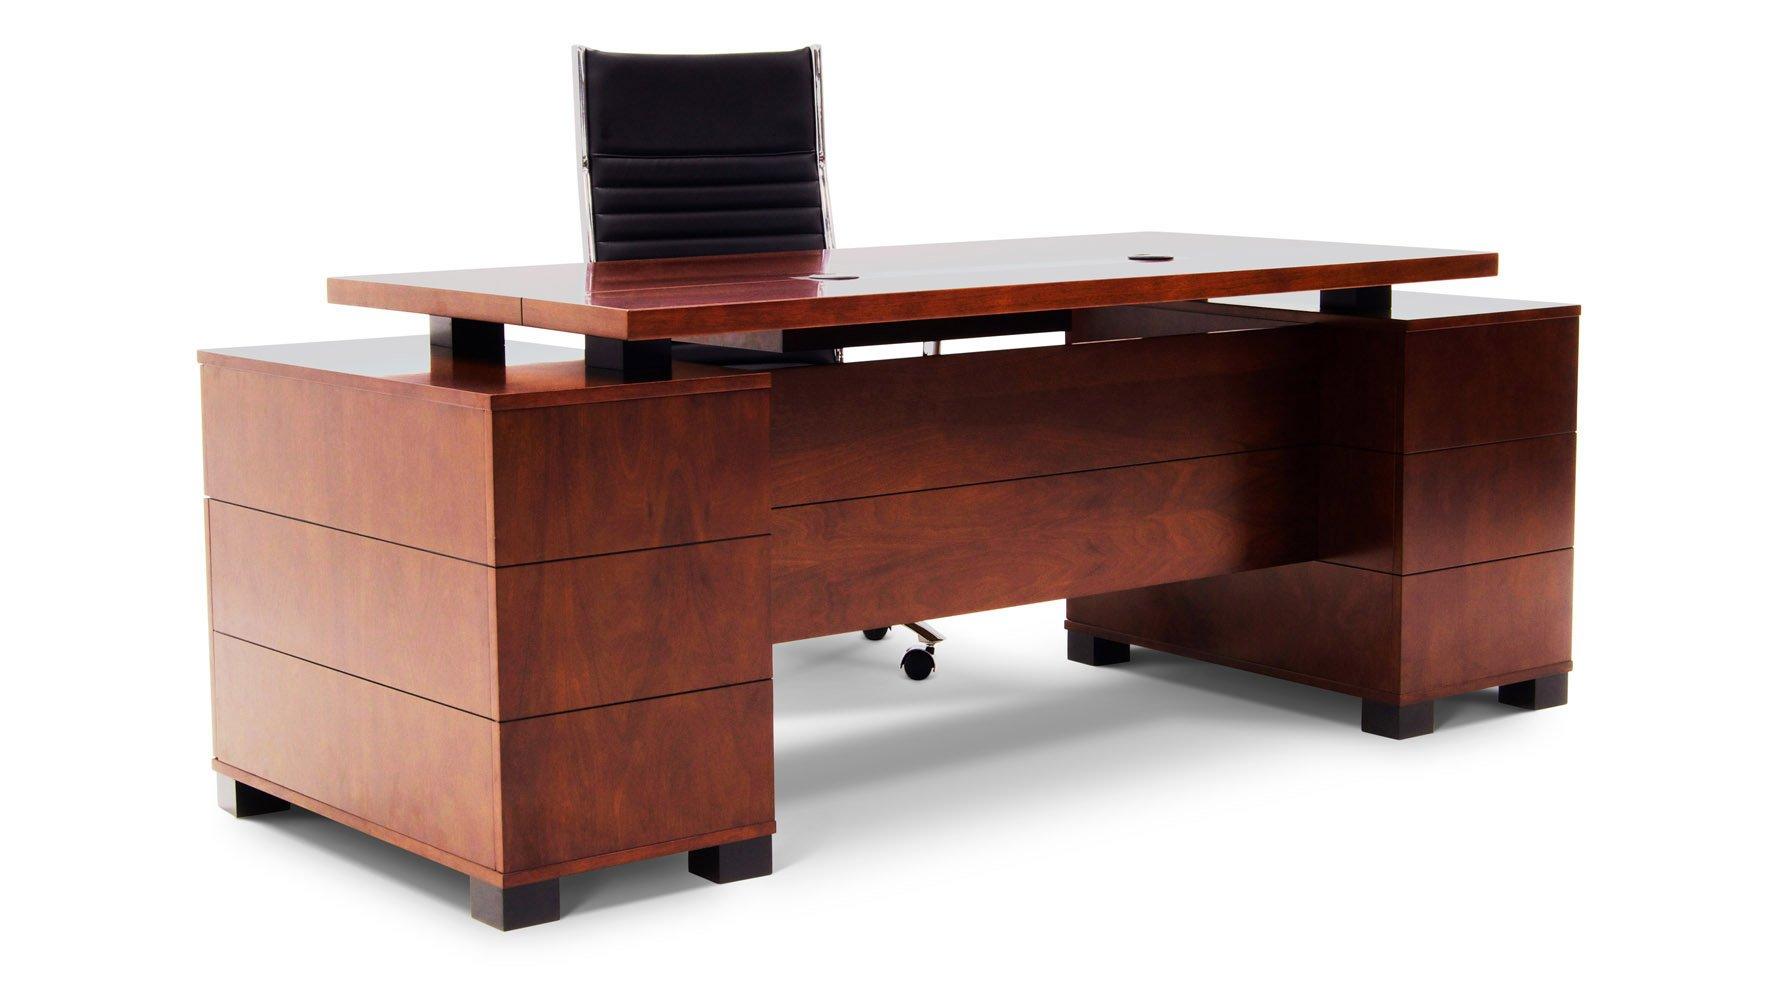 ford executive modern desk with filing cabinets light walnut finish zuri furniture. Black Bedroom Furniture Sets. Home Design Ideas